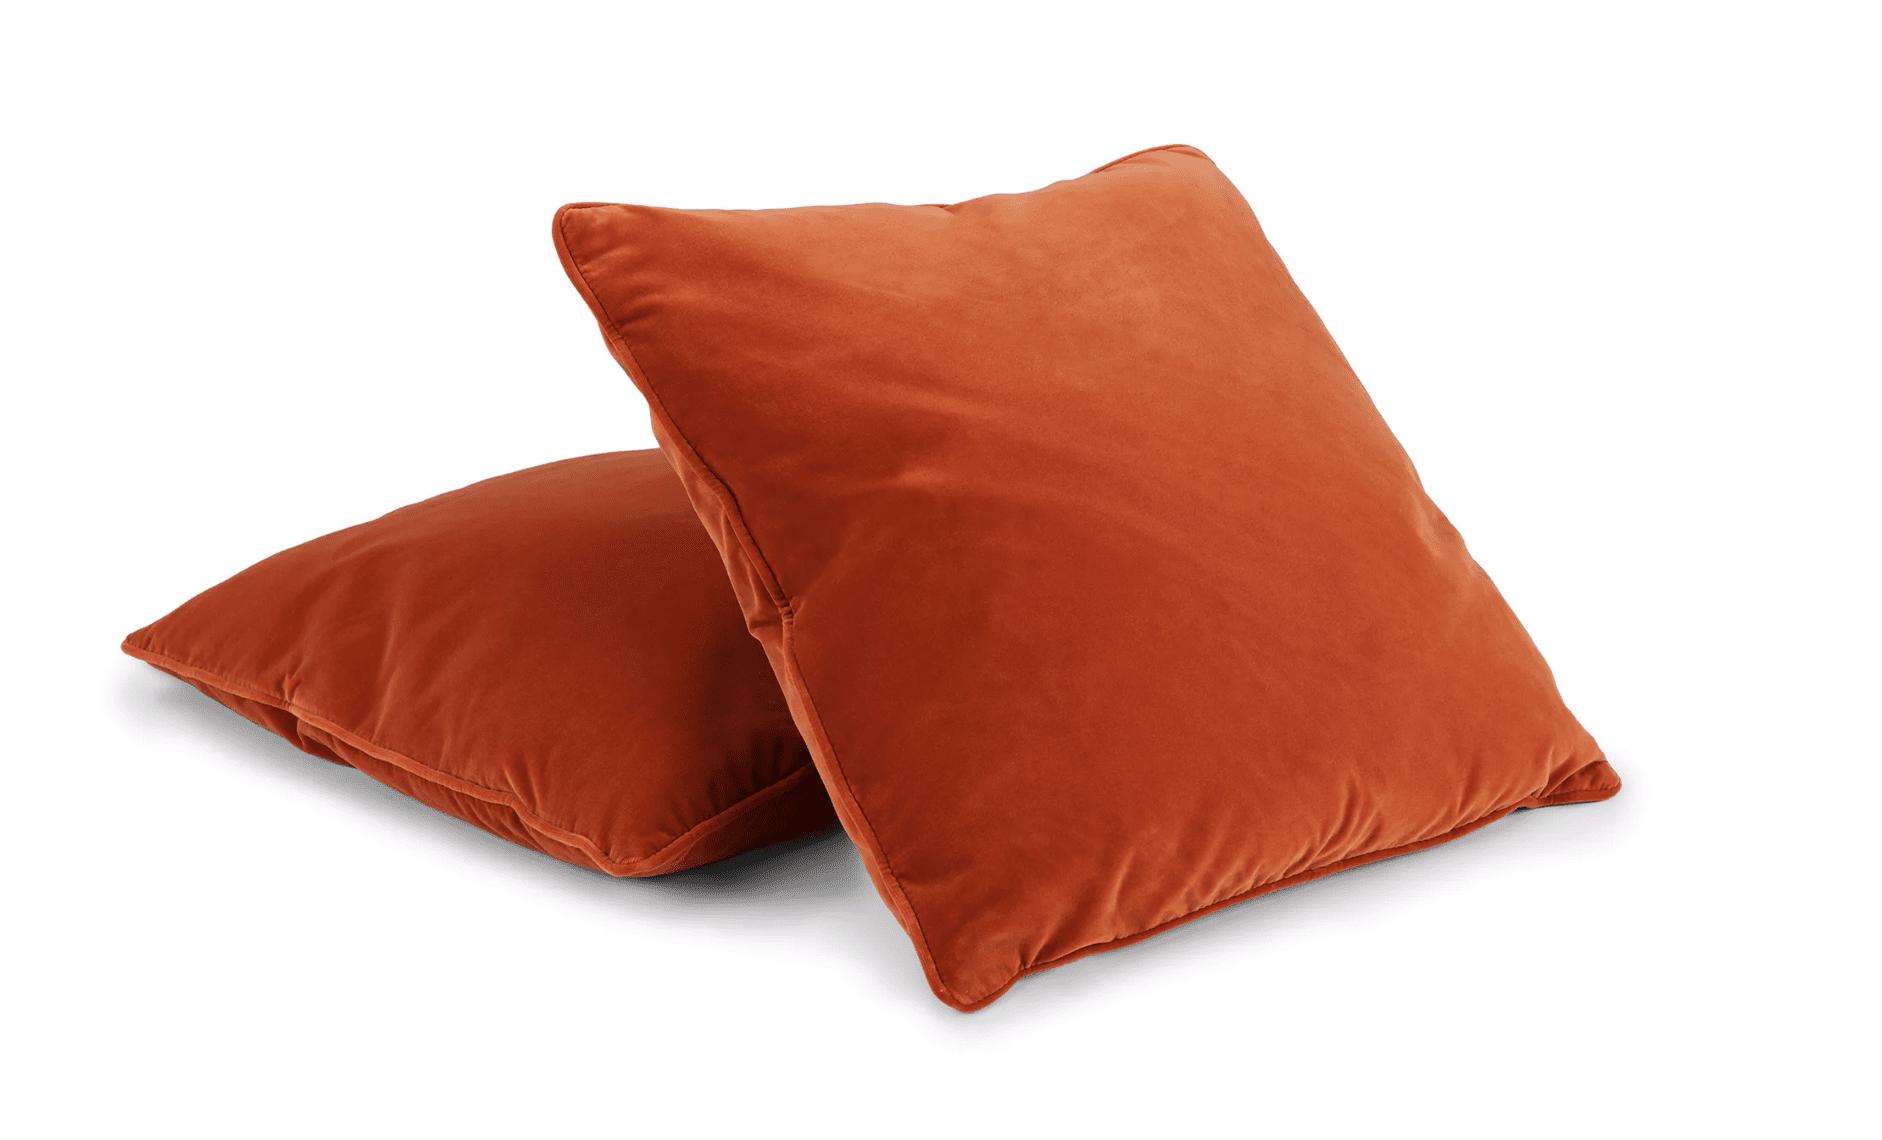 Pair of Article Contemporary velvet pillows in Persimmon Orange